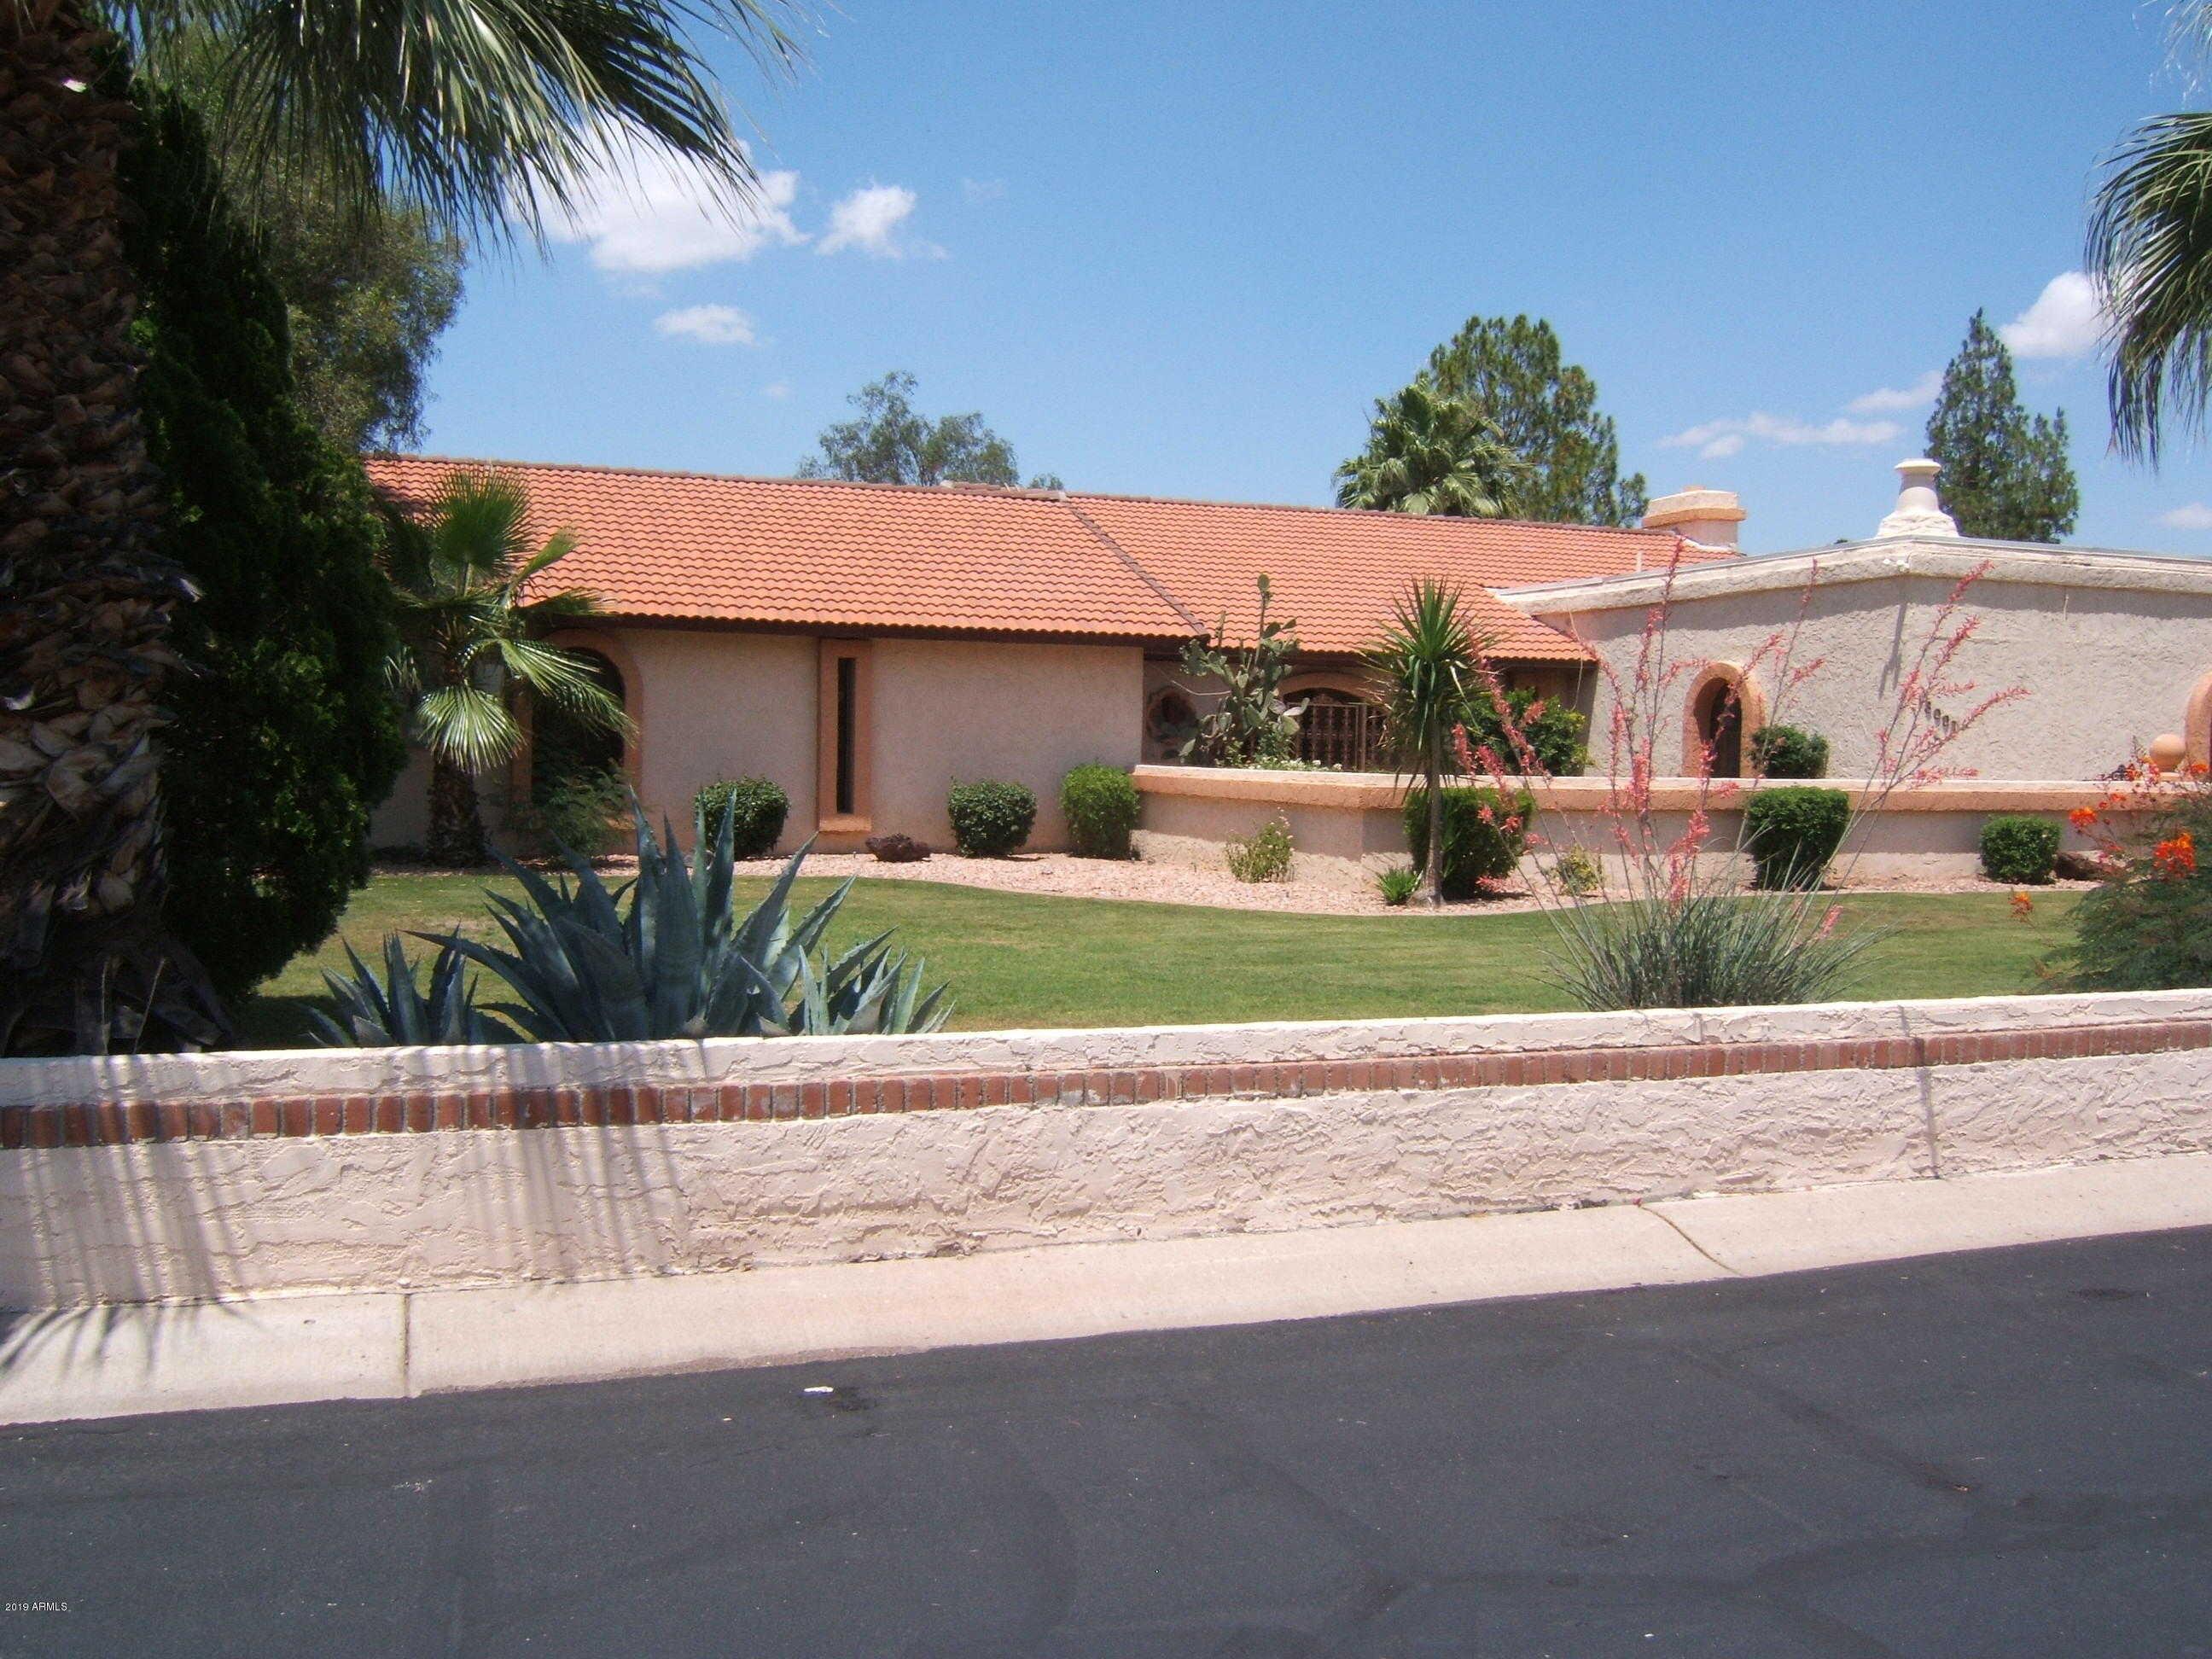 $435,000 - 3Br/3Ba - Home for Sale in Hidden Manor 2 Lot 85-110, Glendale